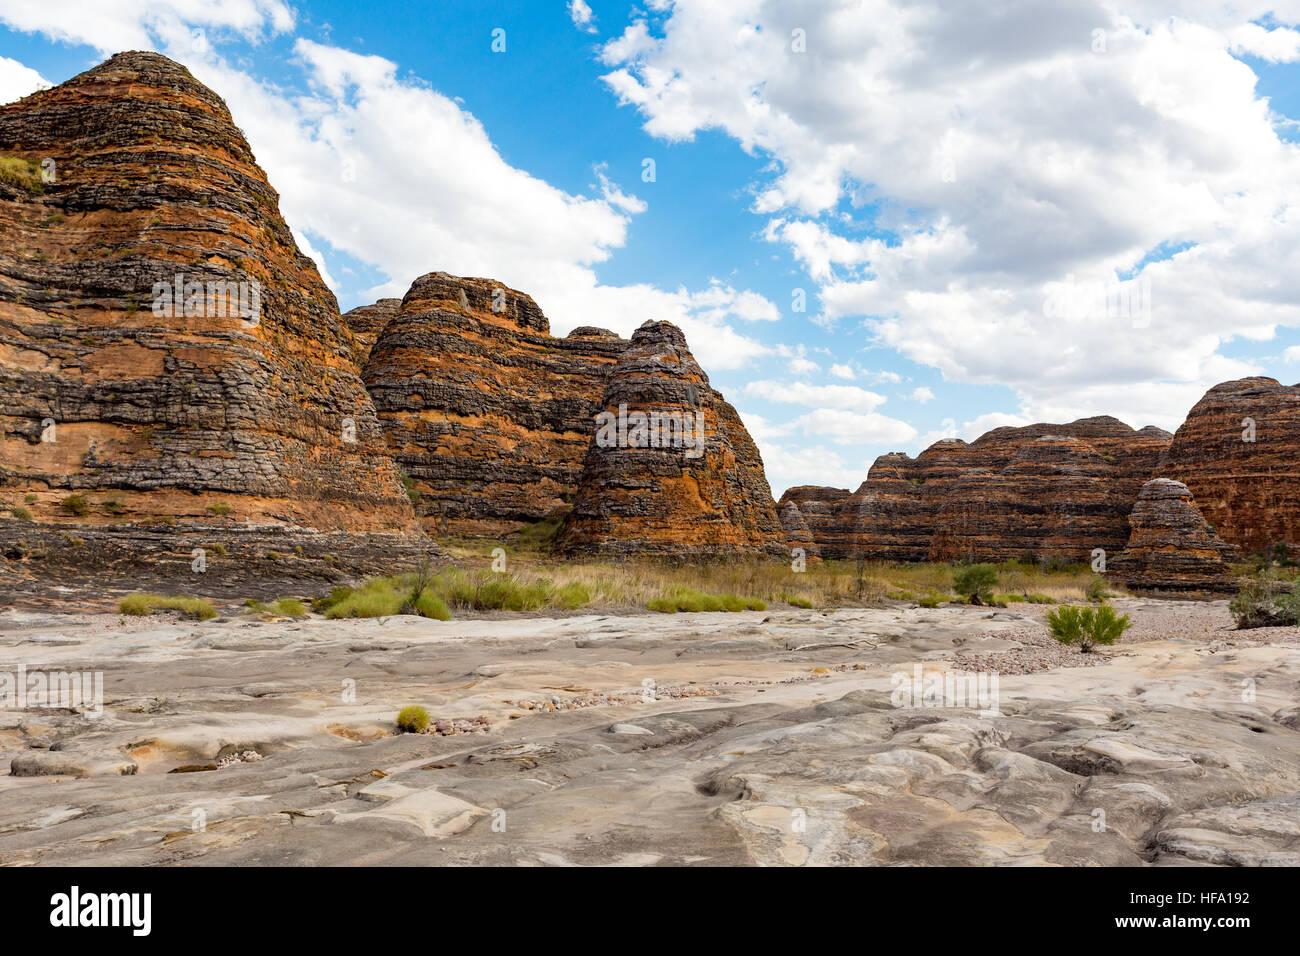 Bungle Bungles, Purnululu National Park, Kimberley, Western Australia - Stock Image